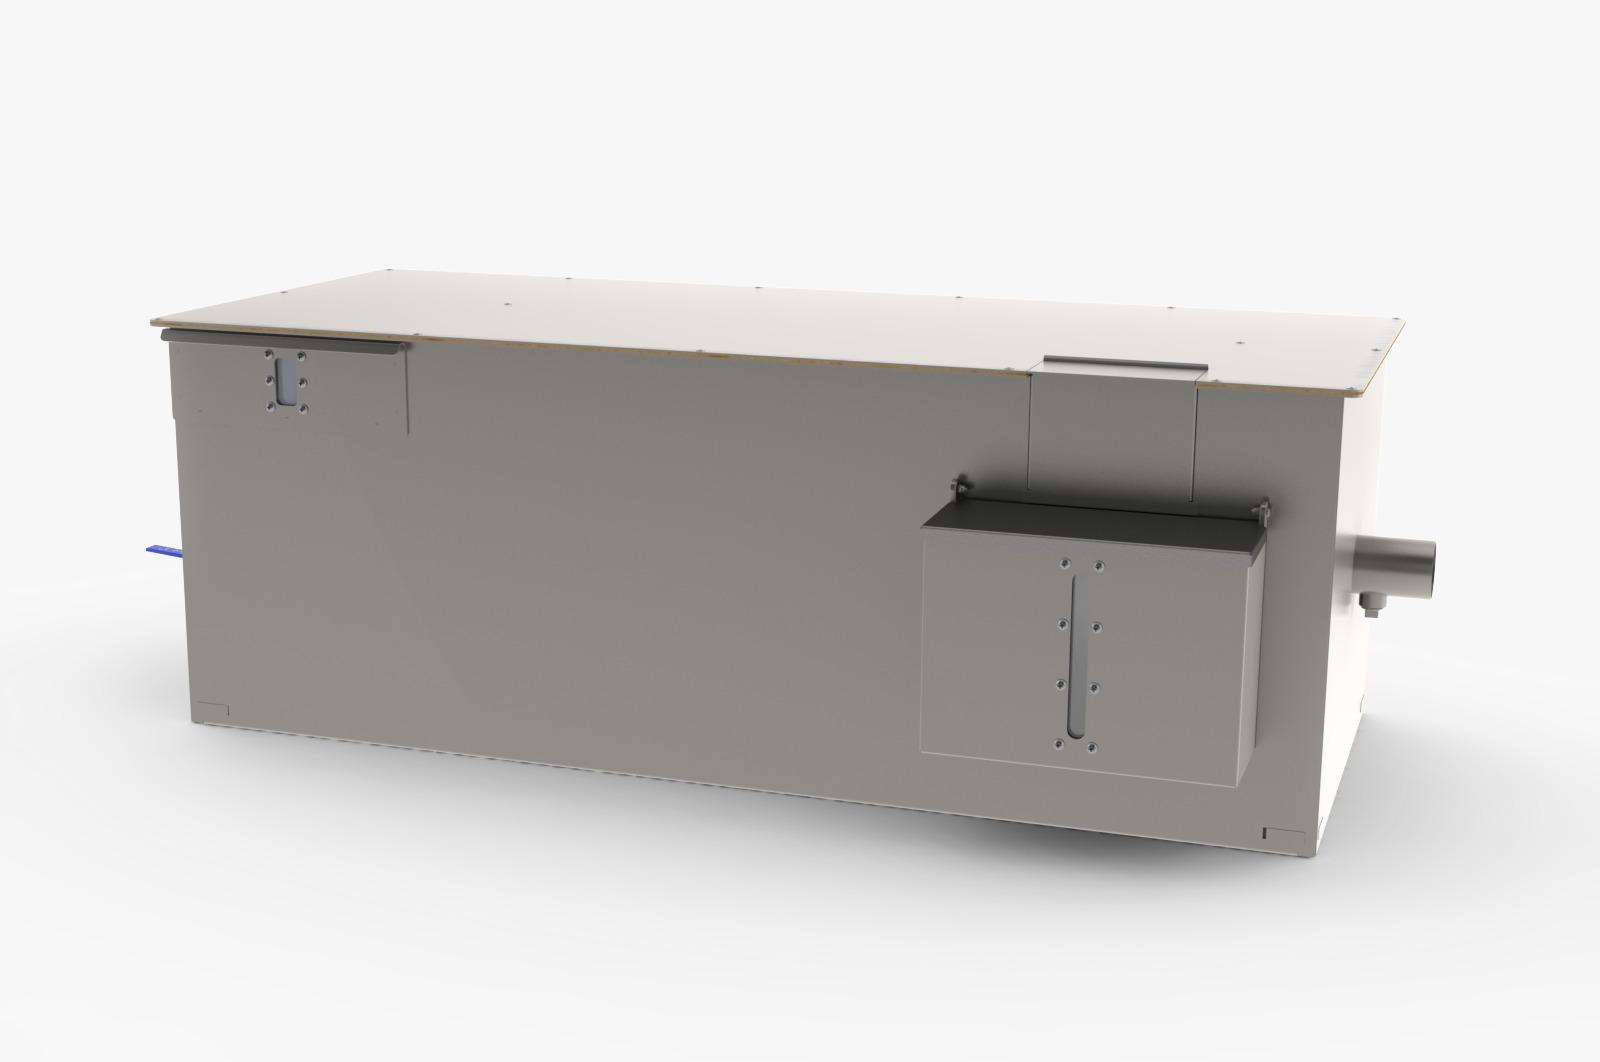 HC5 Grease removal unit - Fog Fellow Designs LTD